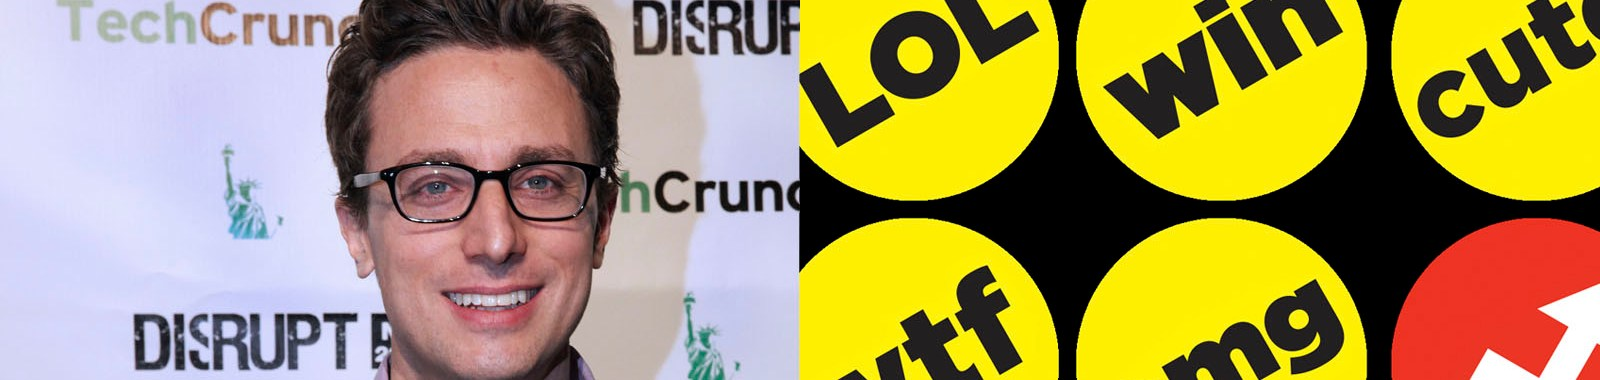 BuzzFeedの創業者ジョナ・ペレッティ氏とBuzzFeedの投票ボタン